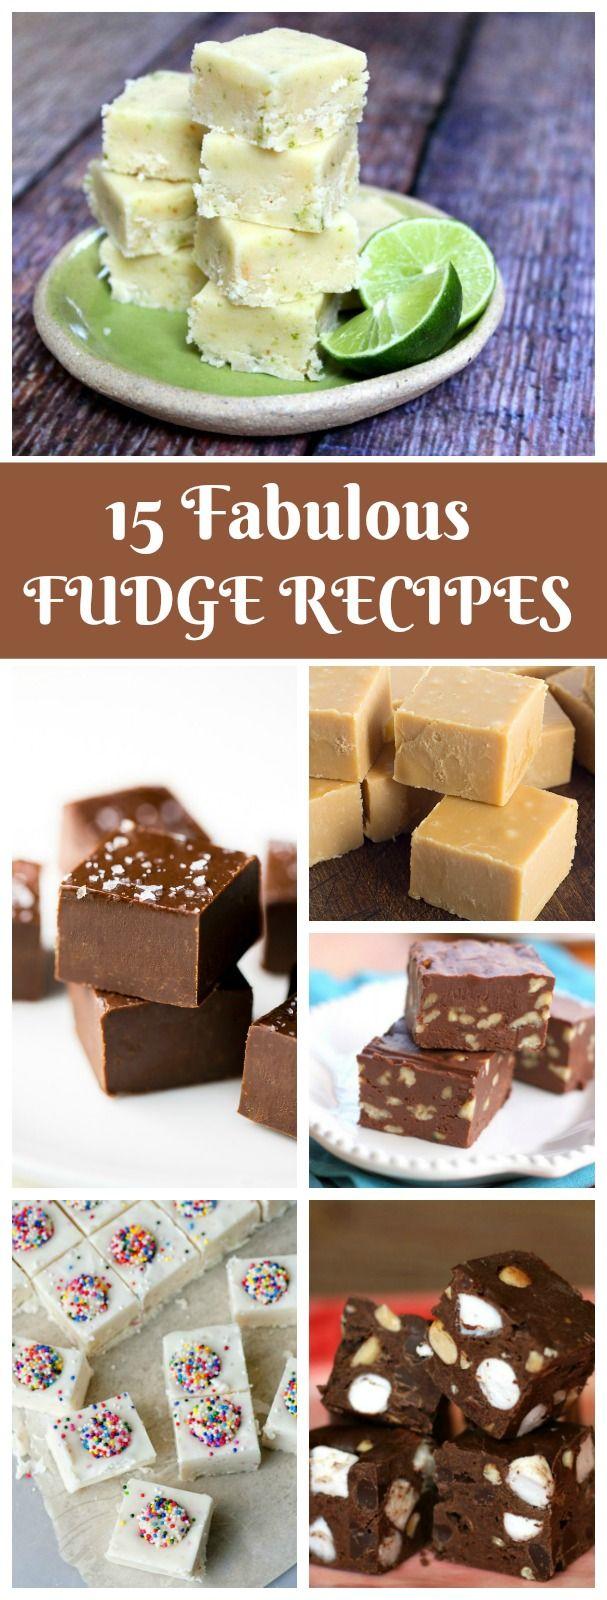 15 Fudge Recipes:  Classic Fudge, Sees Copycat Fudge, S'Mores Fudge, Key Lime Fudge, Snickerdoodle Fudge and more!